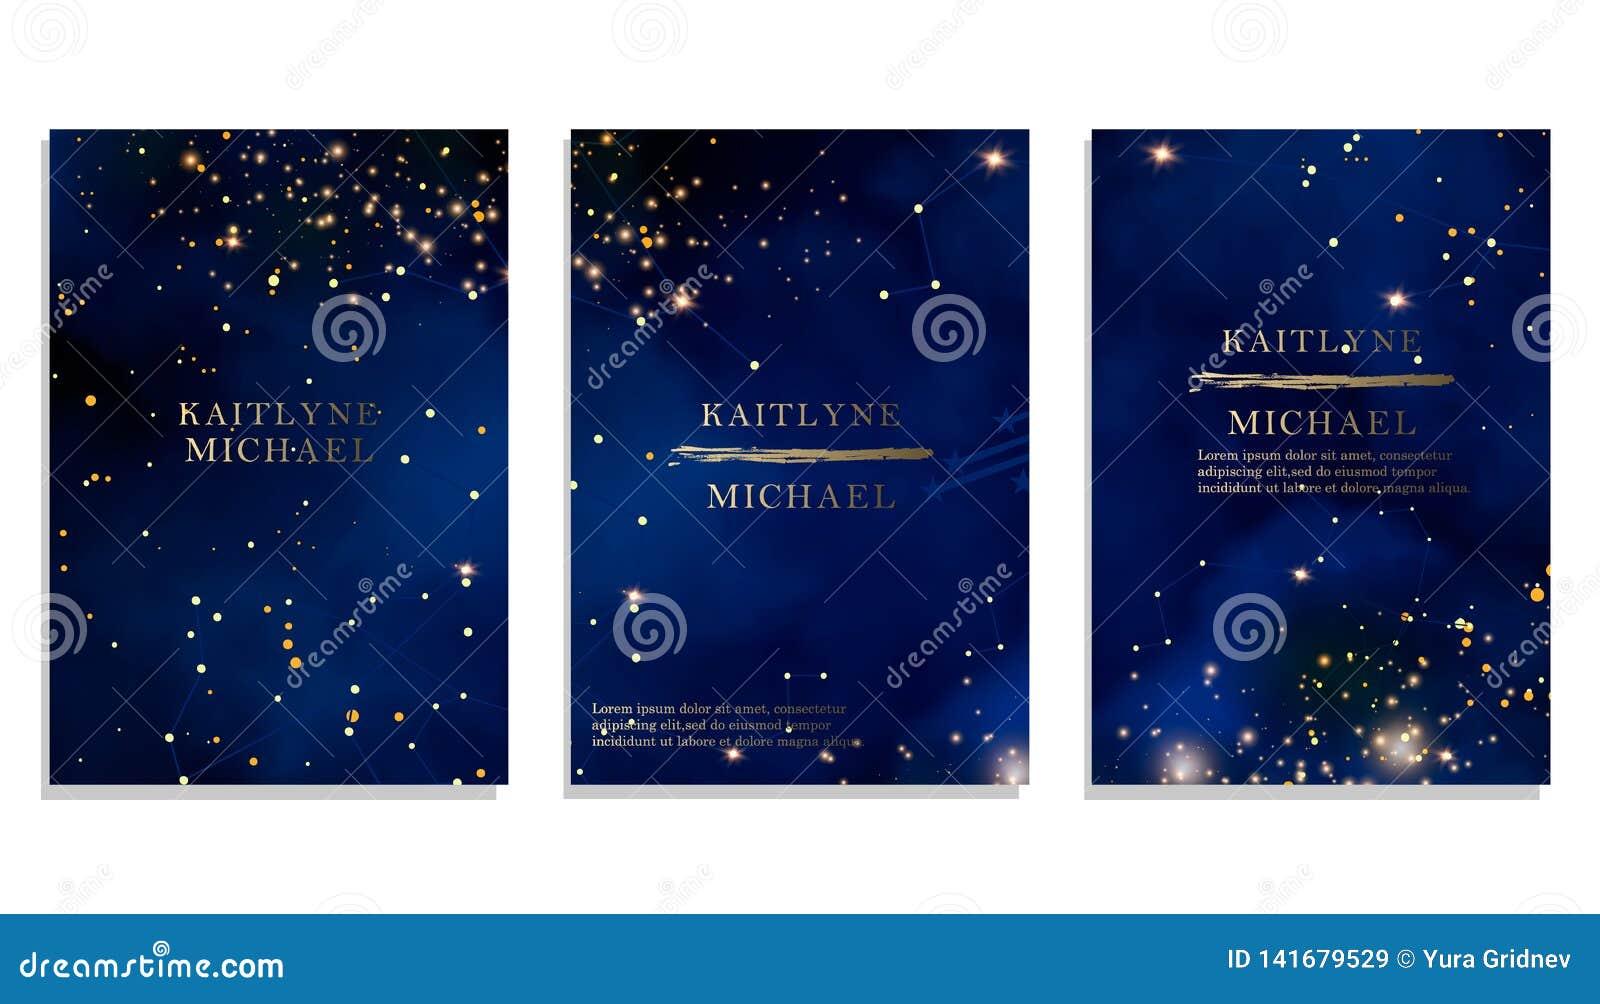 Magic night dark blue sky with sparkling stars vector wedding invitation. Andromeda galaxy. Gold glitter powder splash background